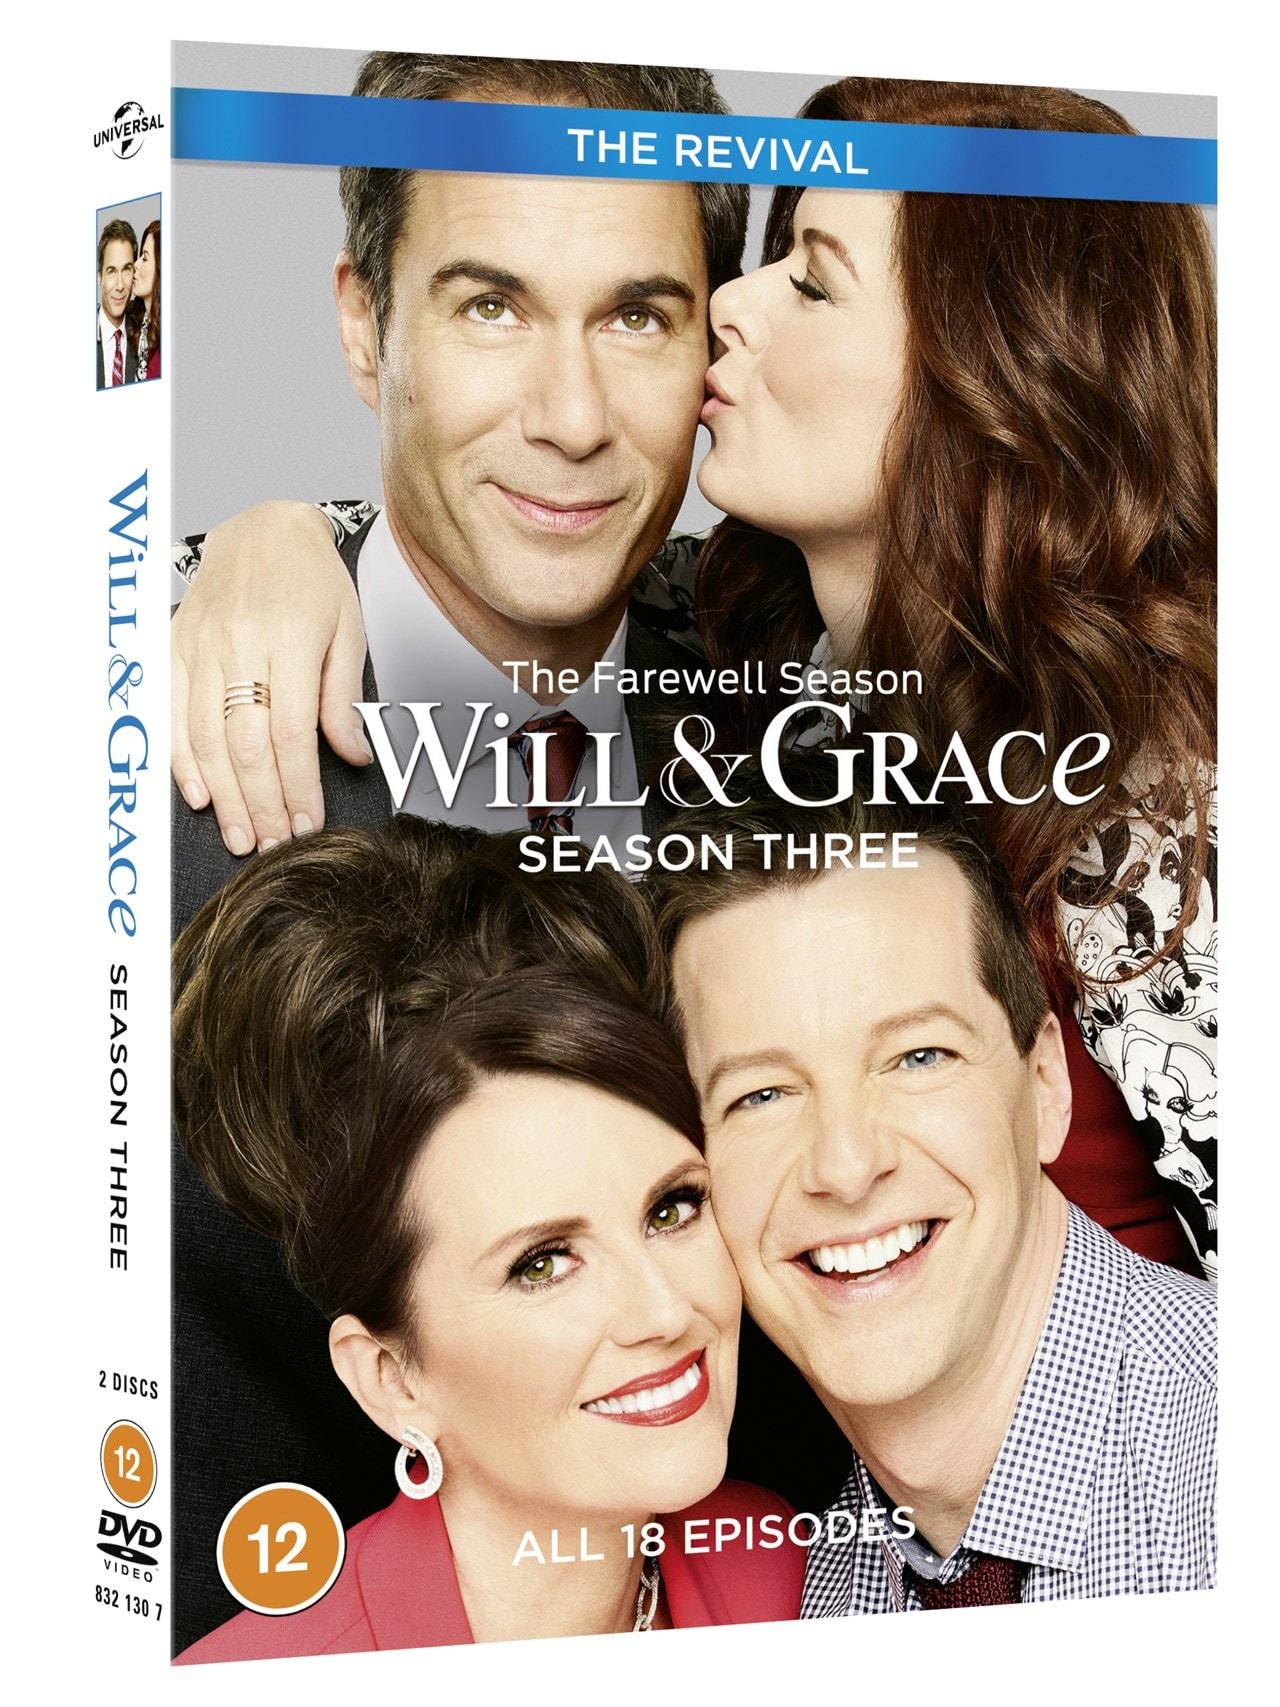 Will and Grace - The Revival: Season Three - The Farewell Season - 2